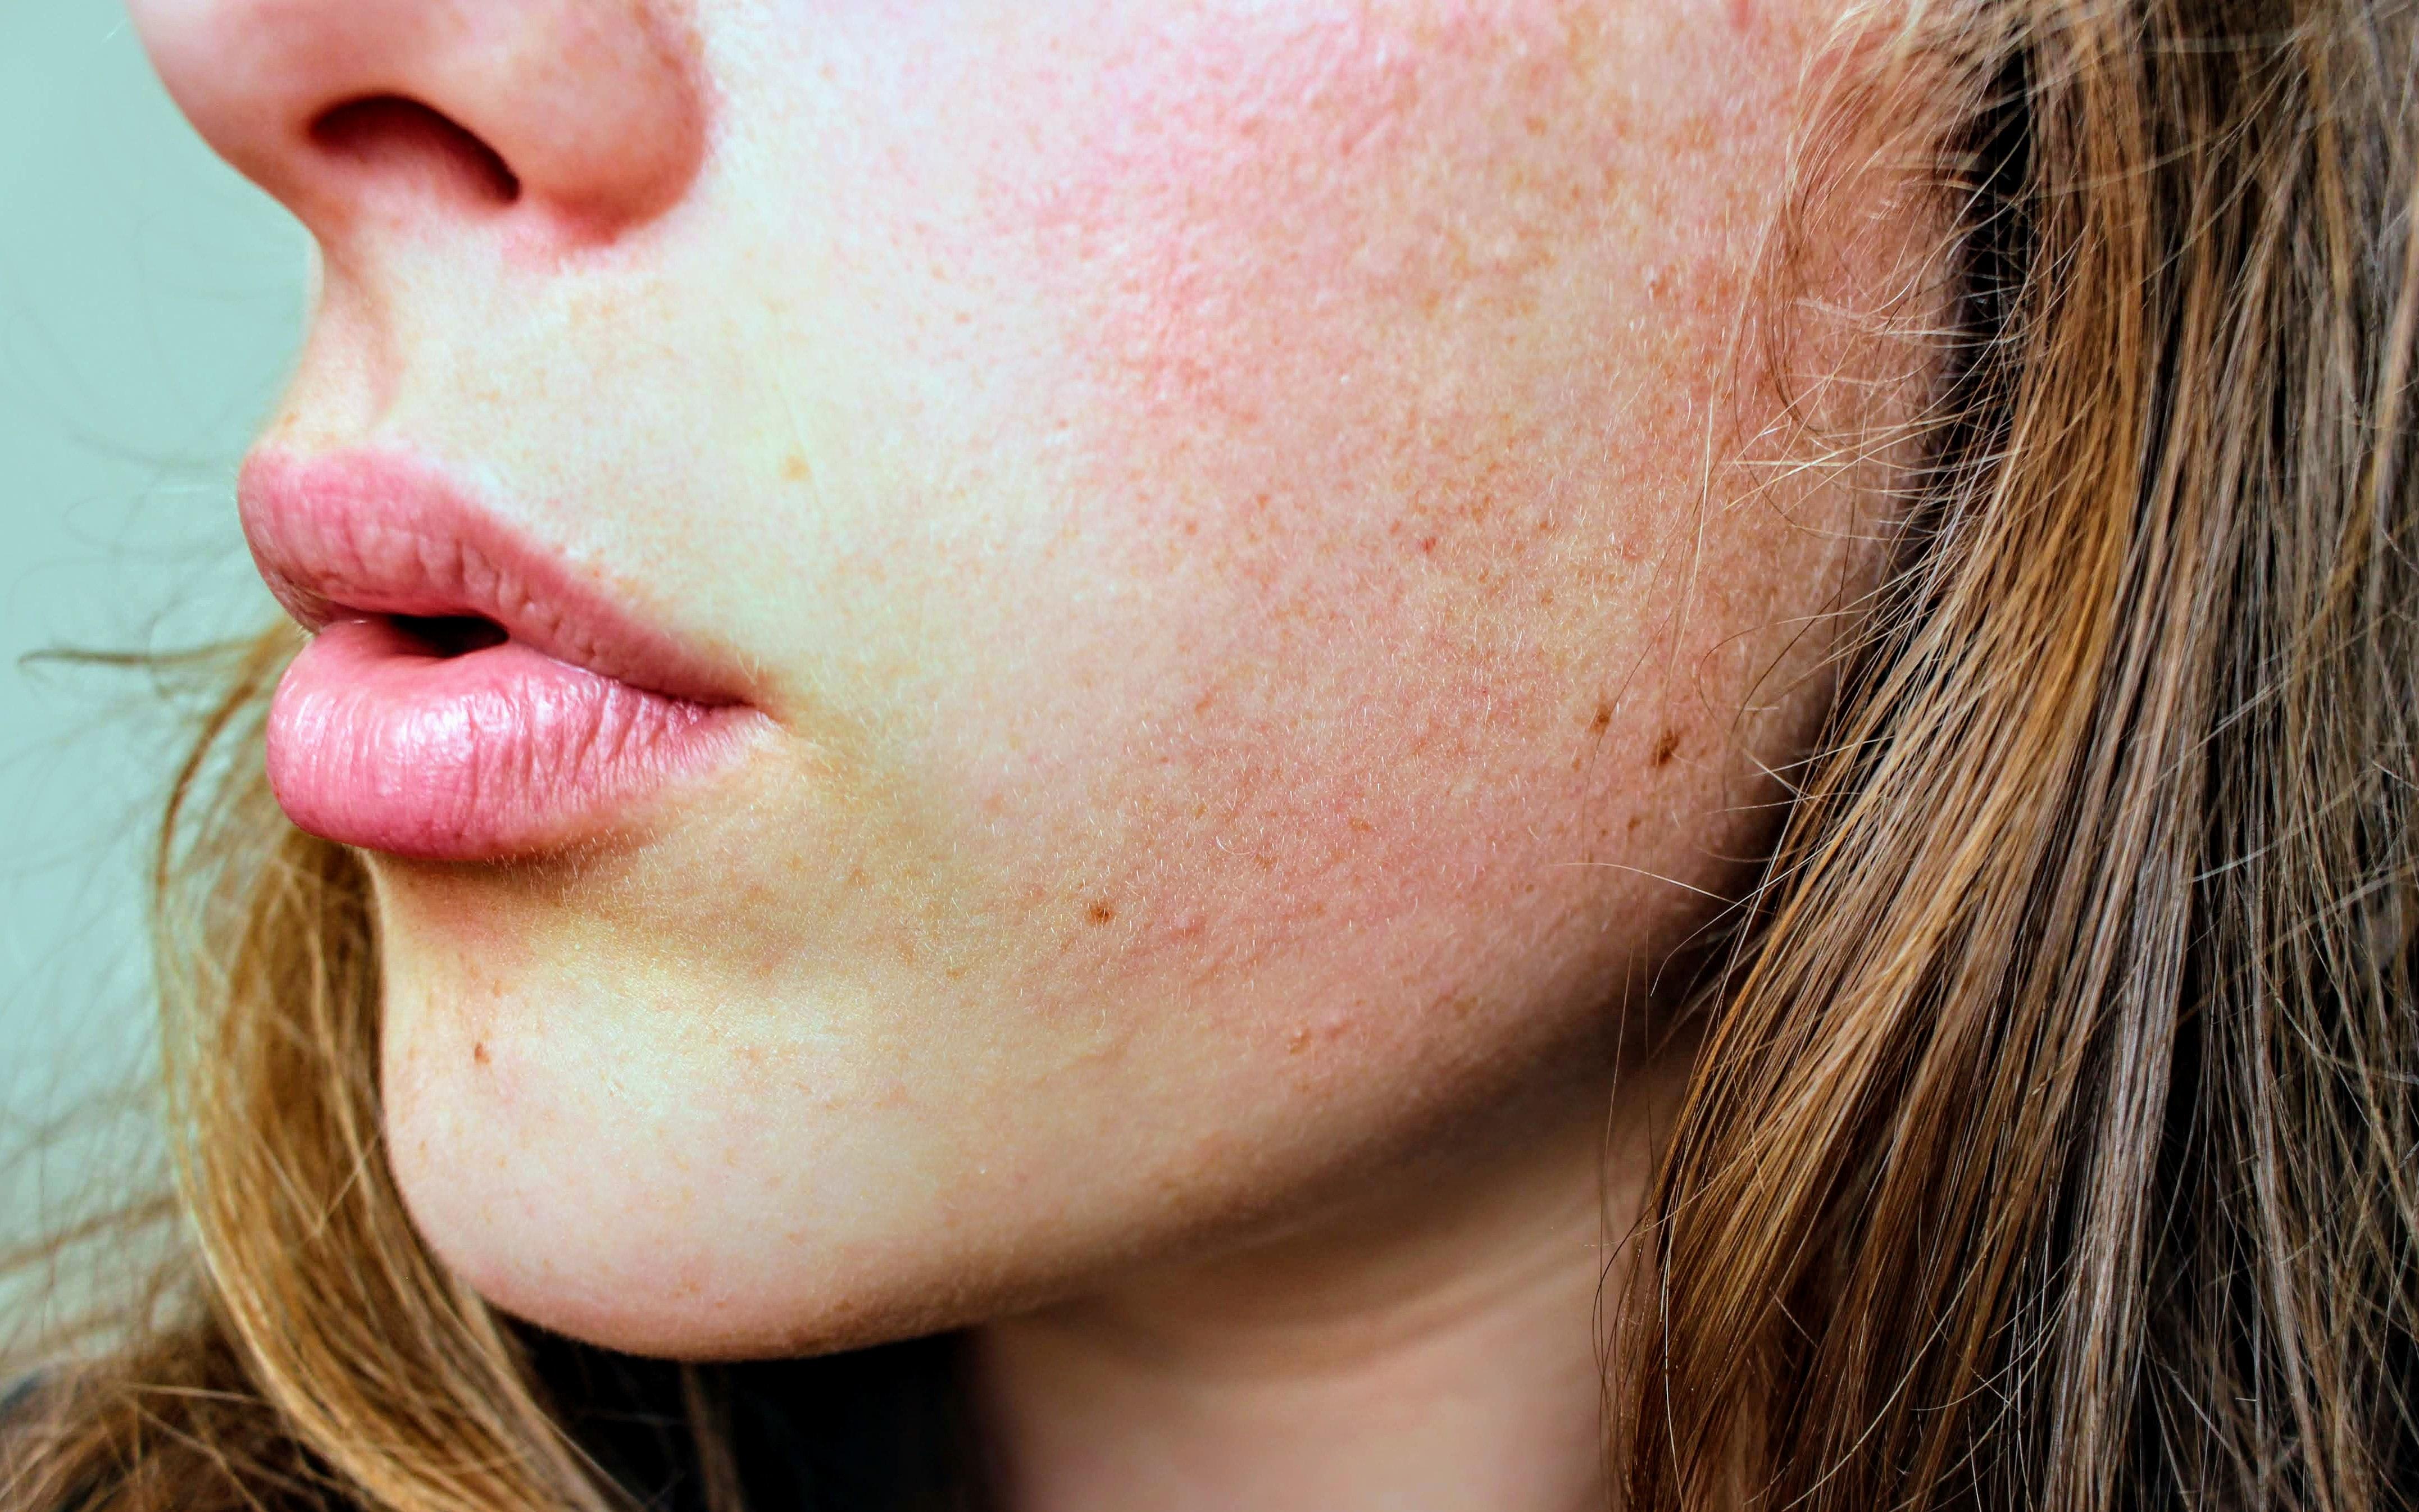 face-hair-human-skin-smooth